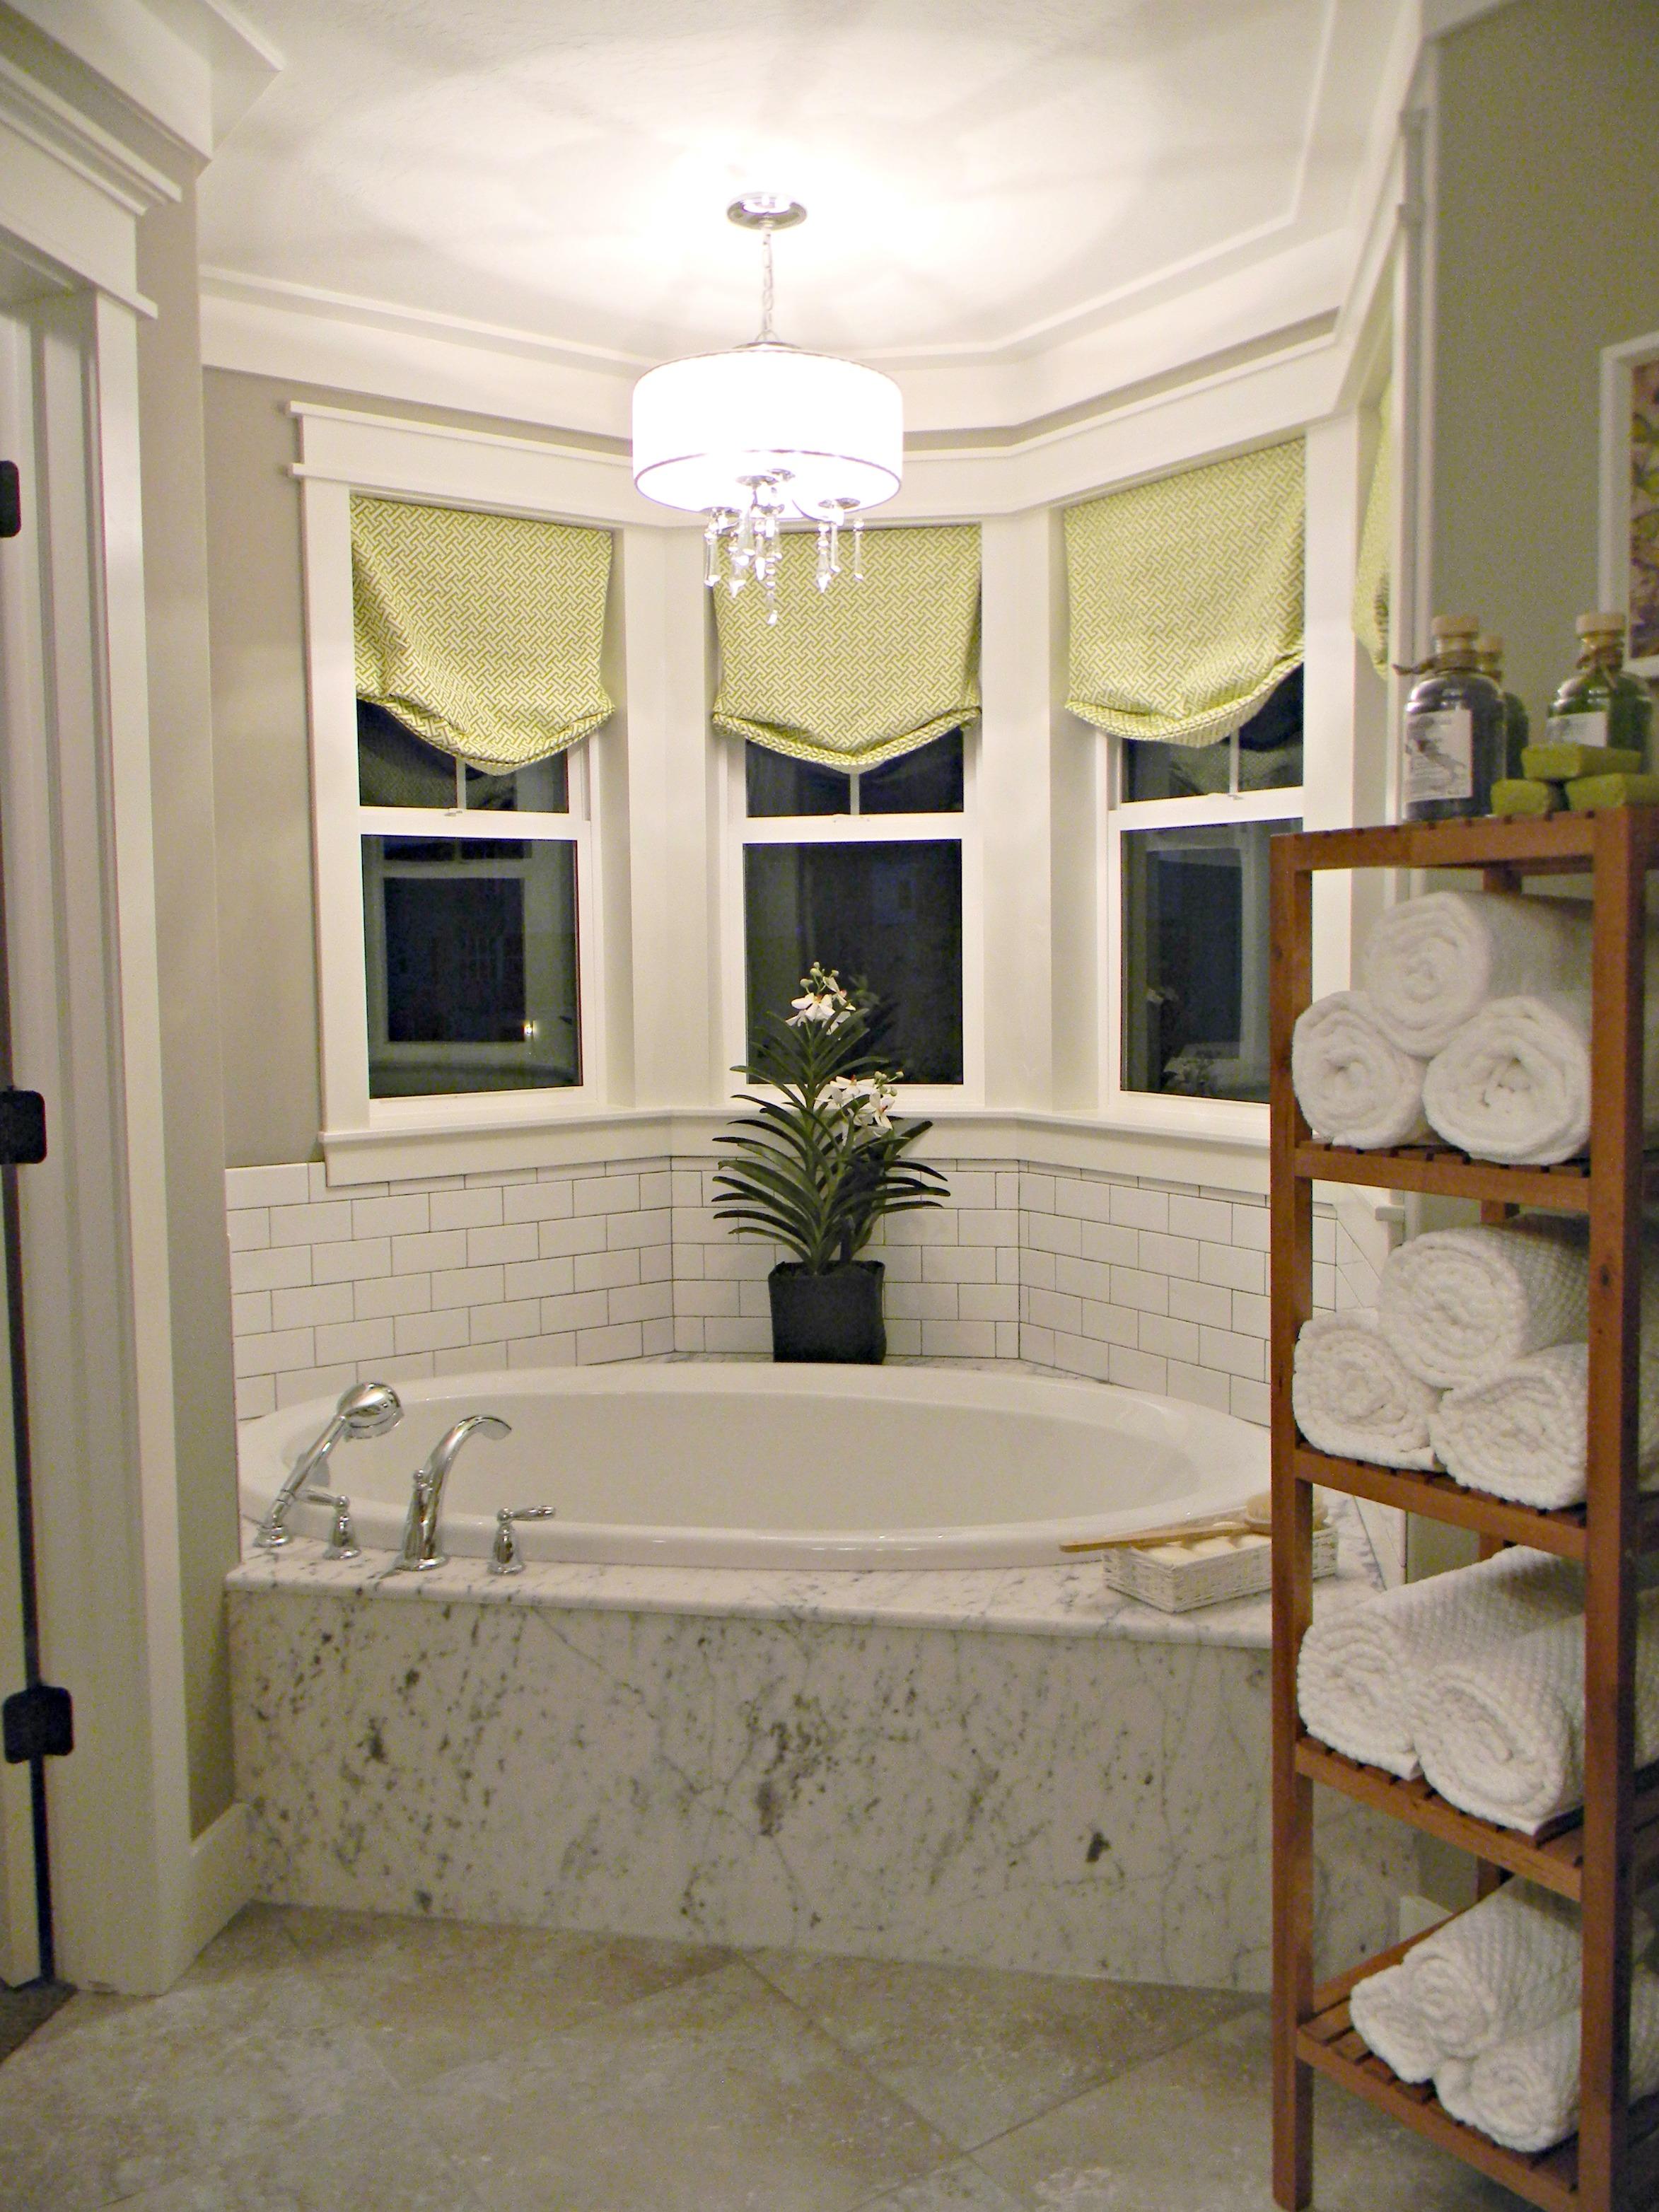 Decorator Blogs wonderful home decorator blogs part - 5: blog about house